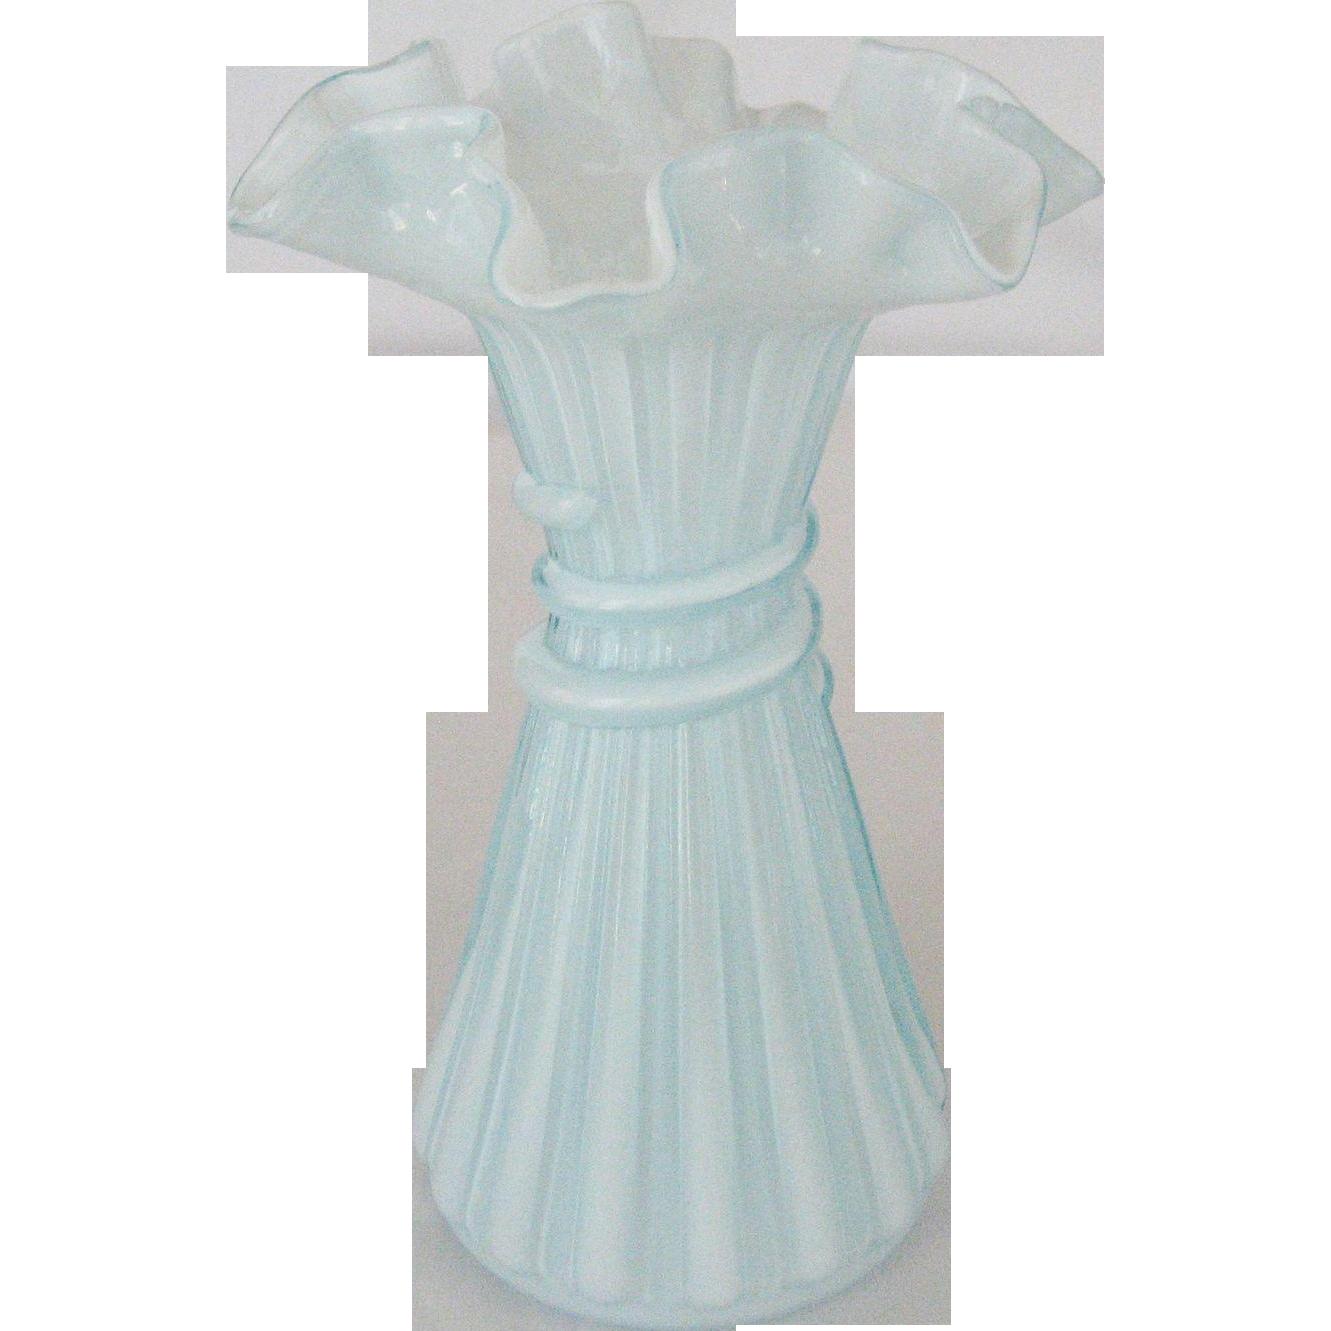 Fenton Blue Cased Wheat Vase